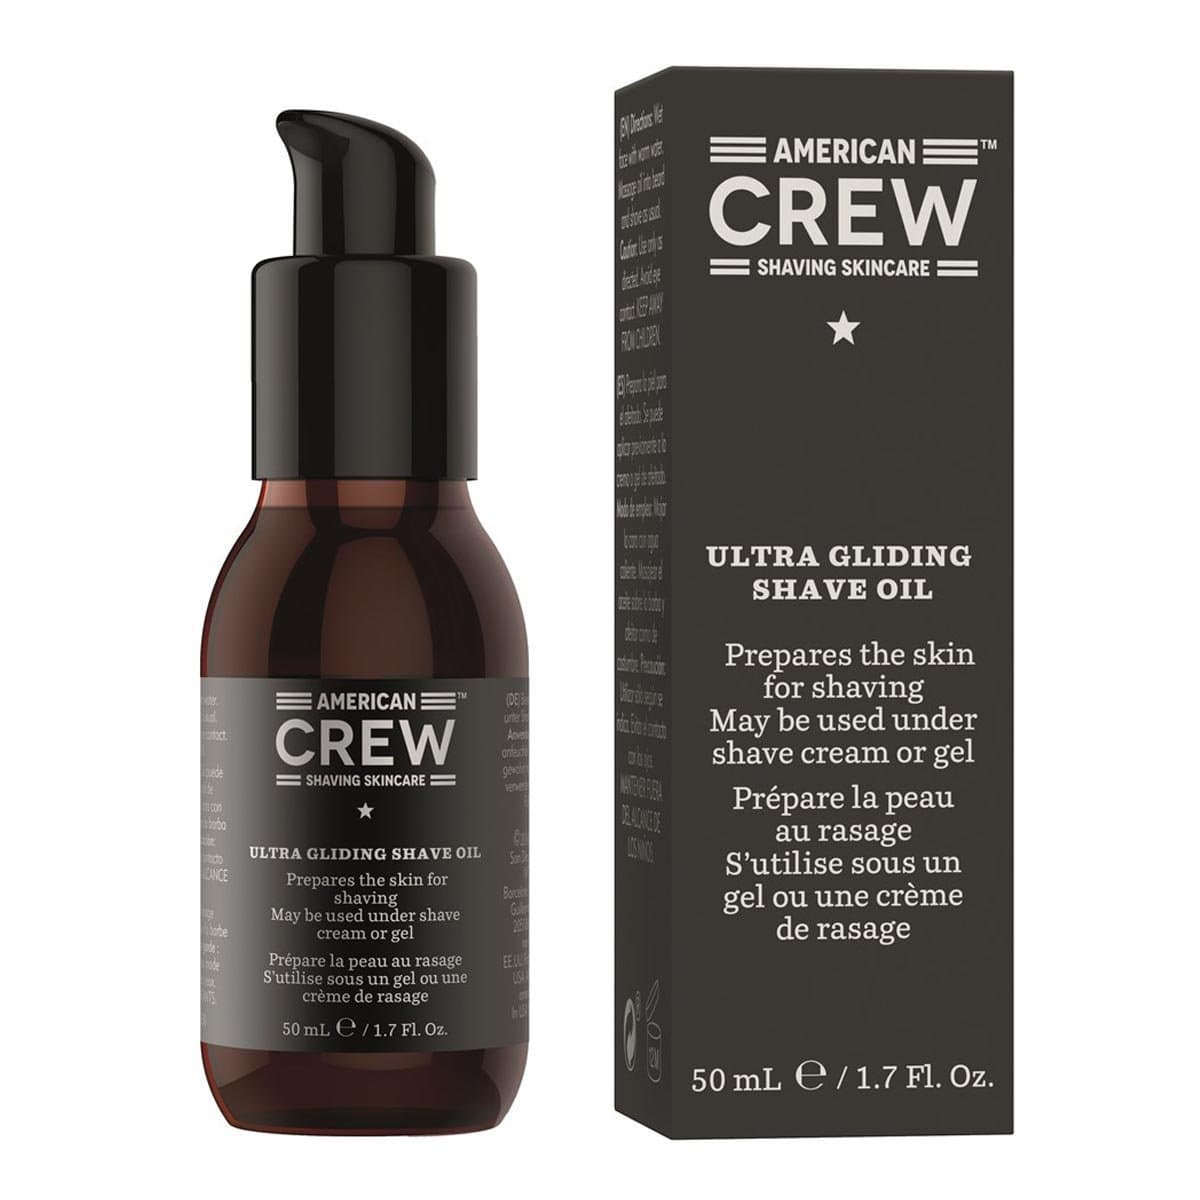 American Crew Shaving Skincare Ultra Gliding Shave Oil Масло Для Бритья